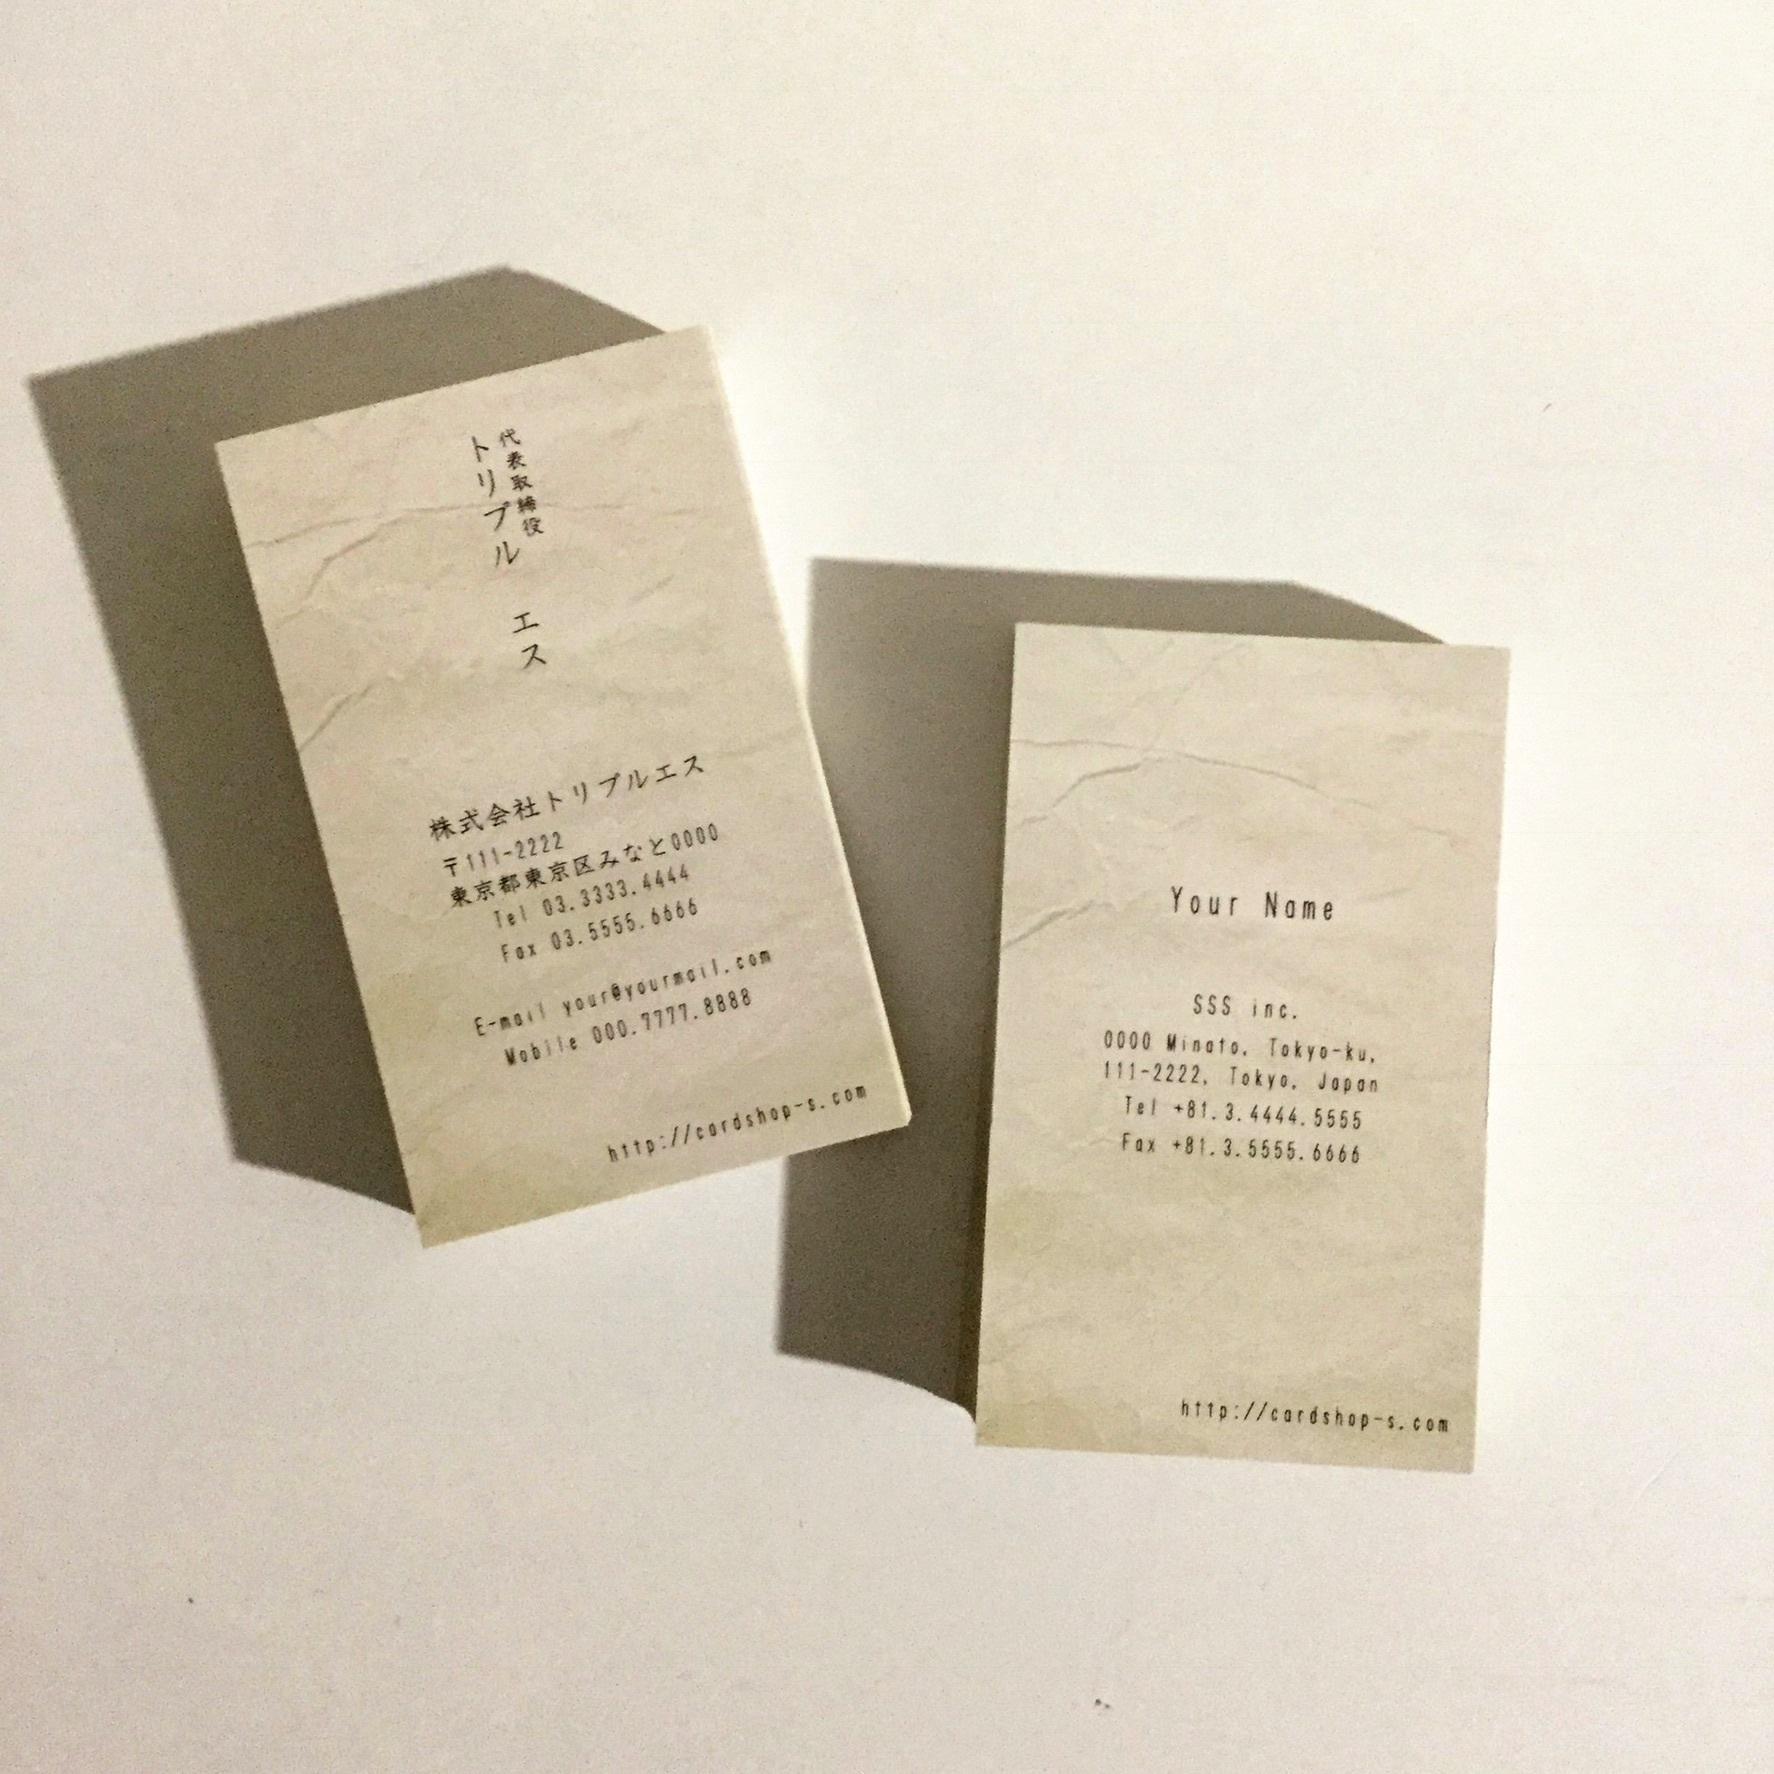 36d1_biz【100枚】ビジネス名刺【英表記】